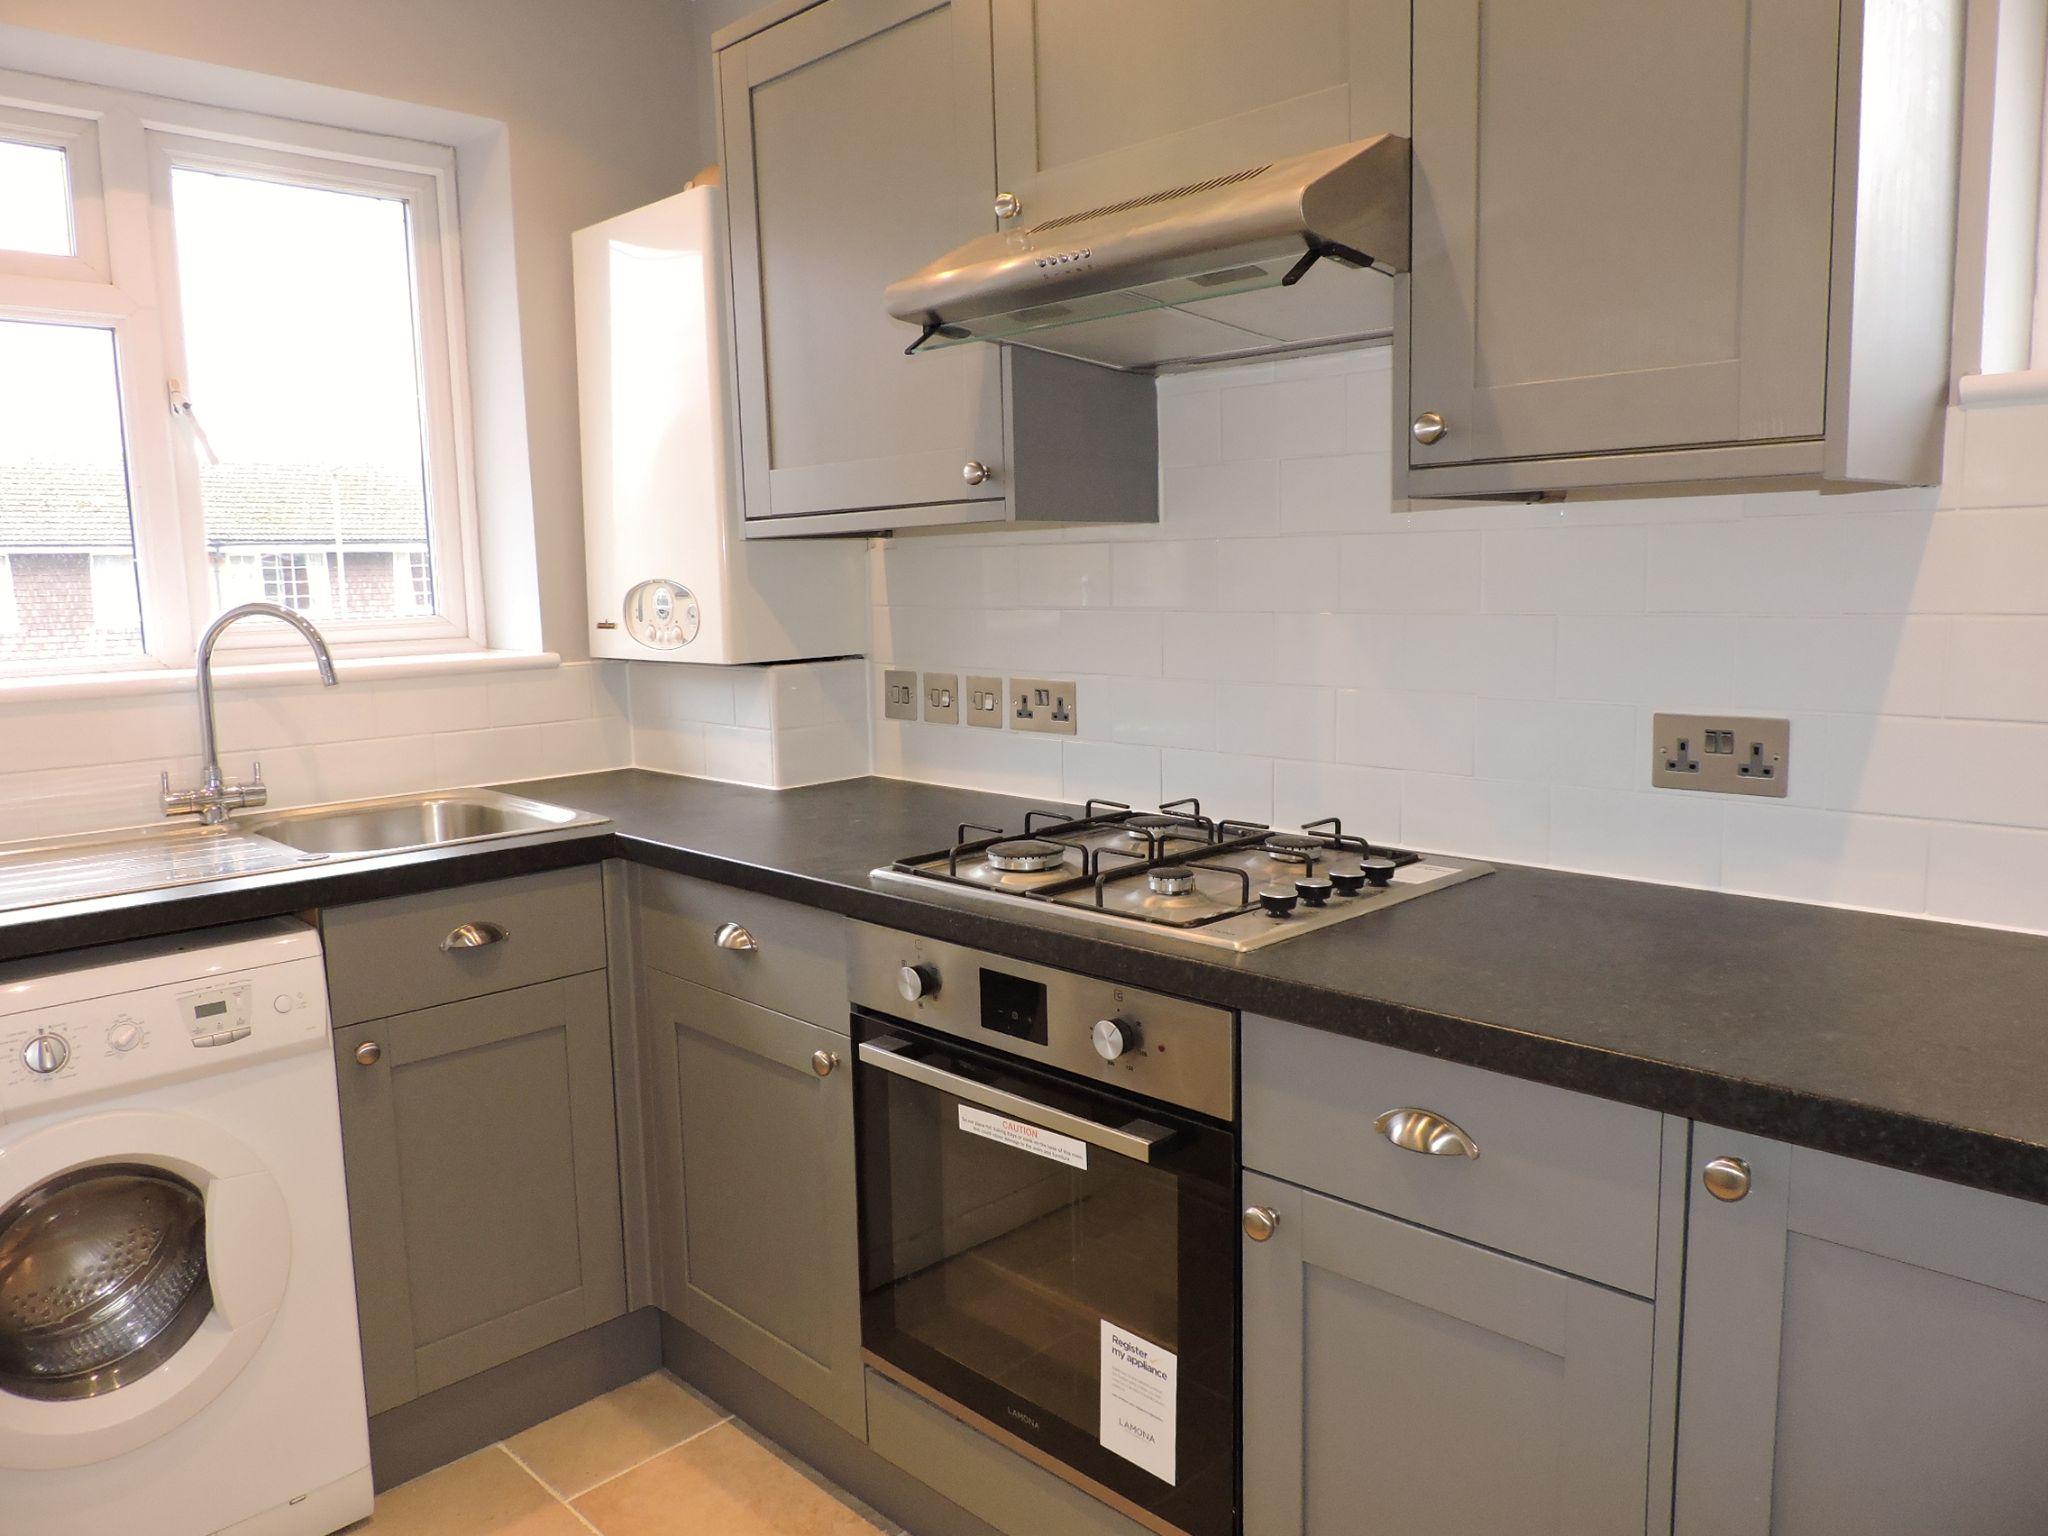 1 bedroom maisonette flat/apartment Let in Cobham - Photograph 4